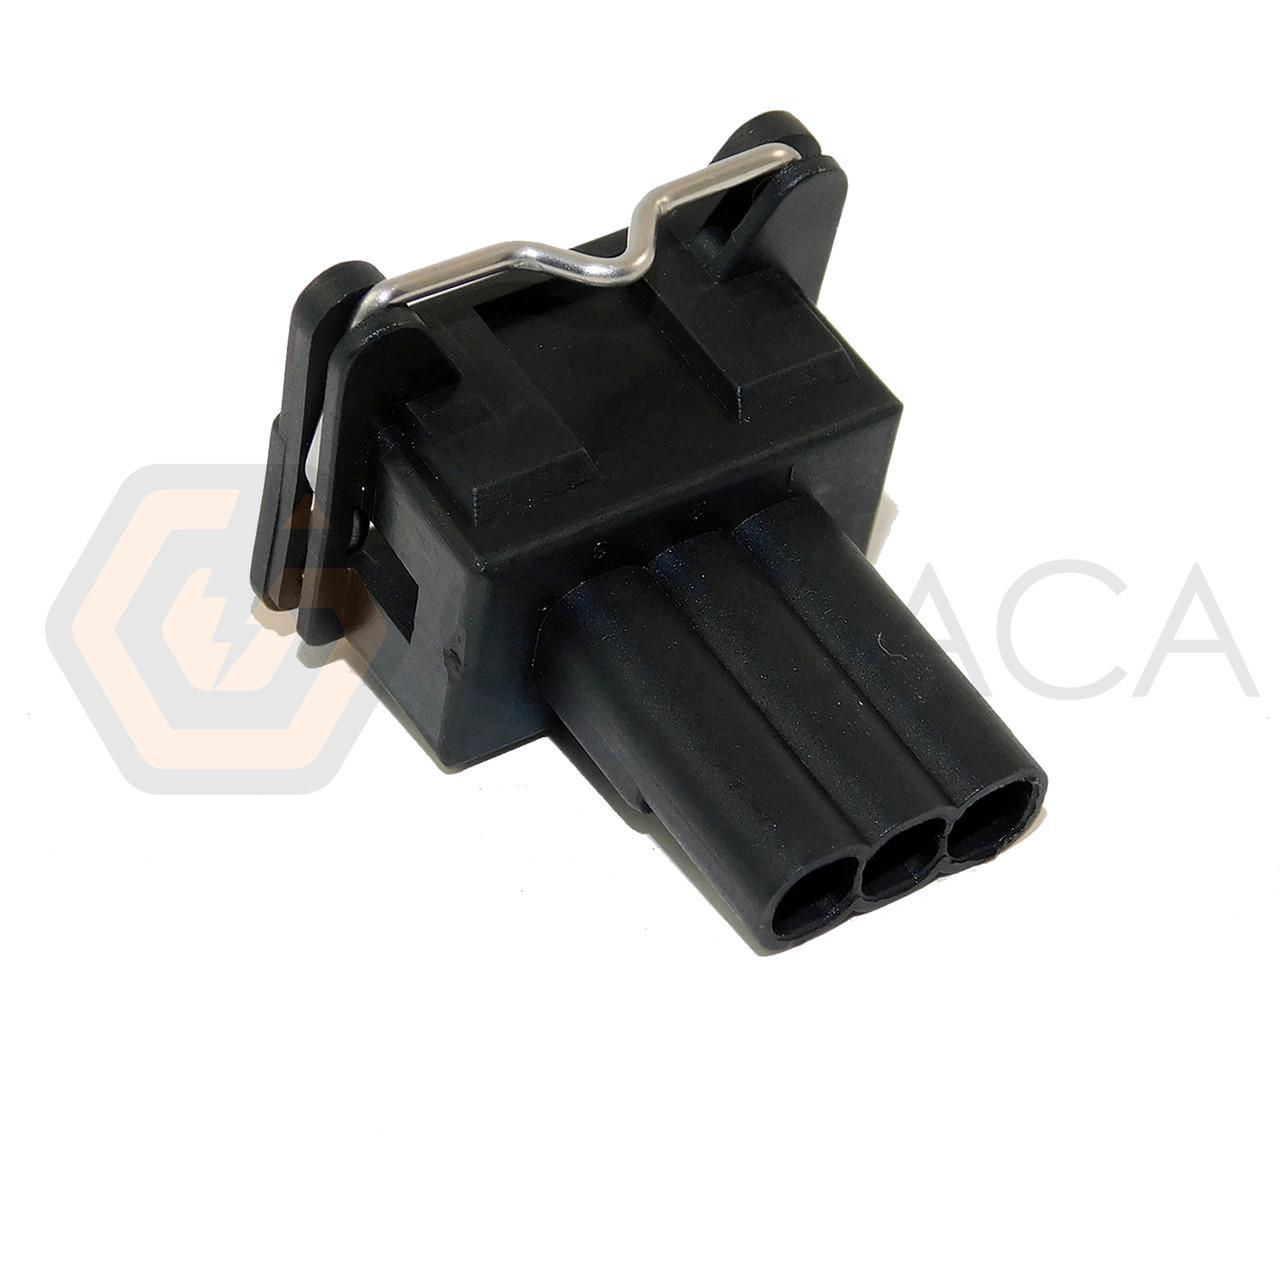 Car Fuel Injector 16450-MFE-641 DC 12V for Honda CBR250RA 2011 VT750C2B 2012